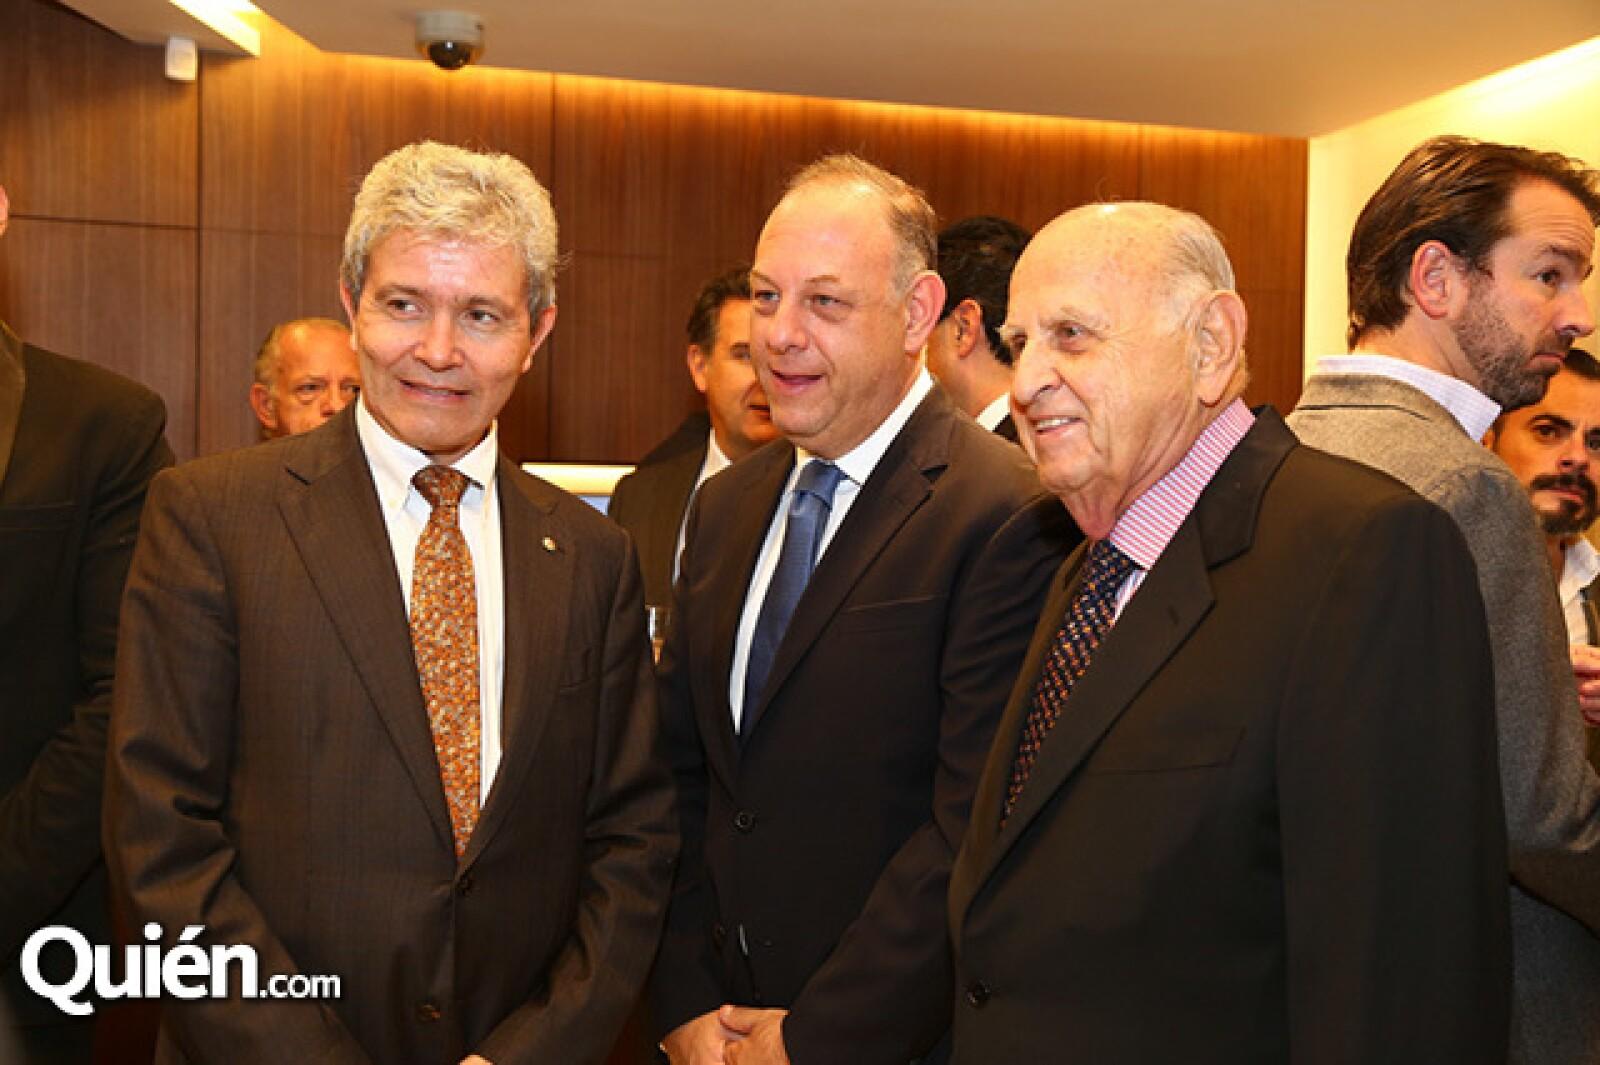 Luis José Touron, Embajador de Suiza, Ari y Maurice Berger